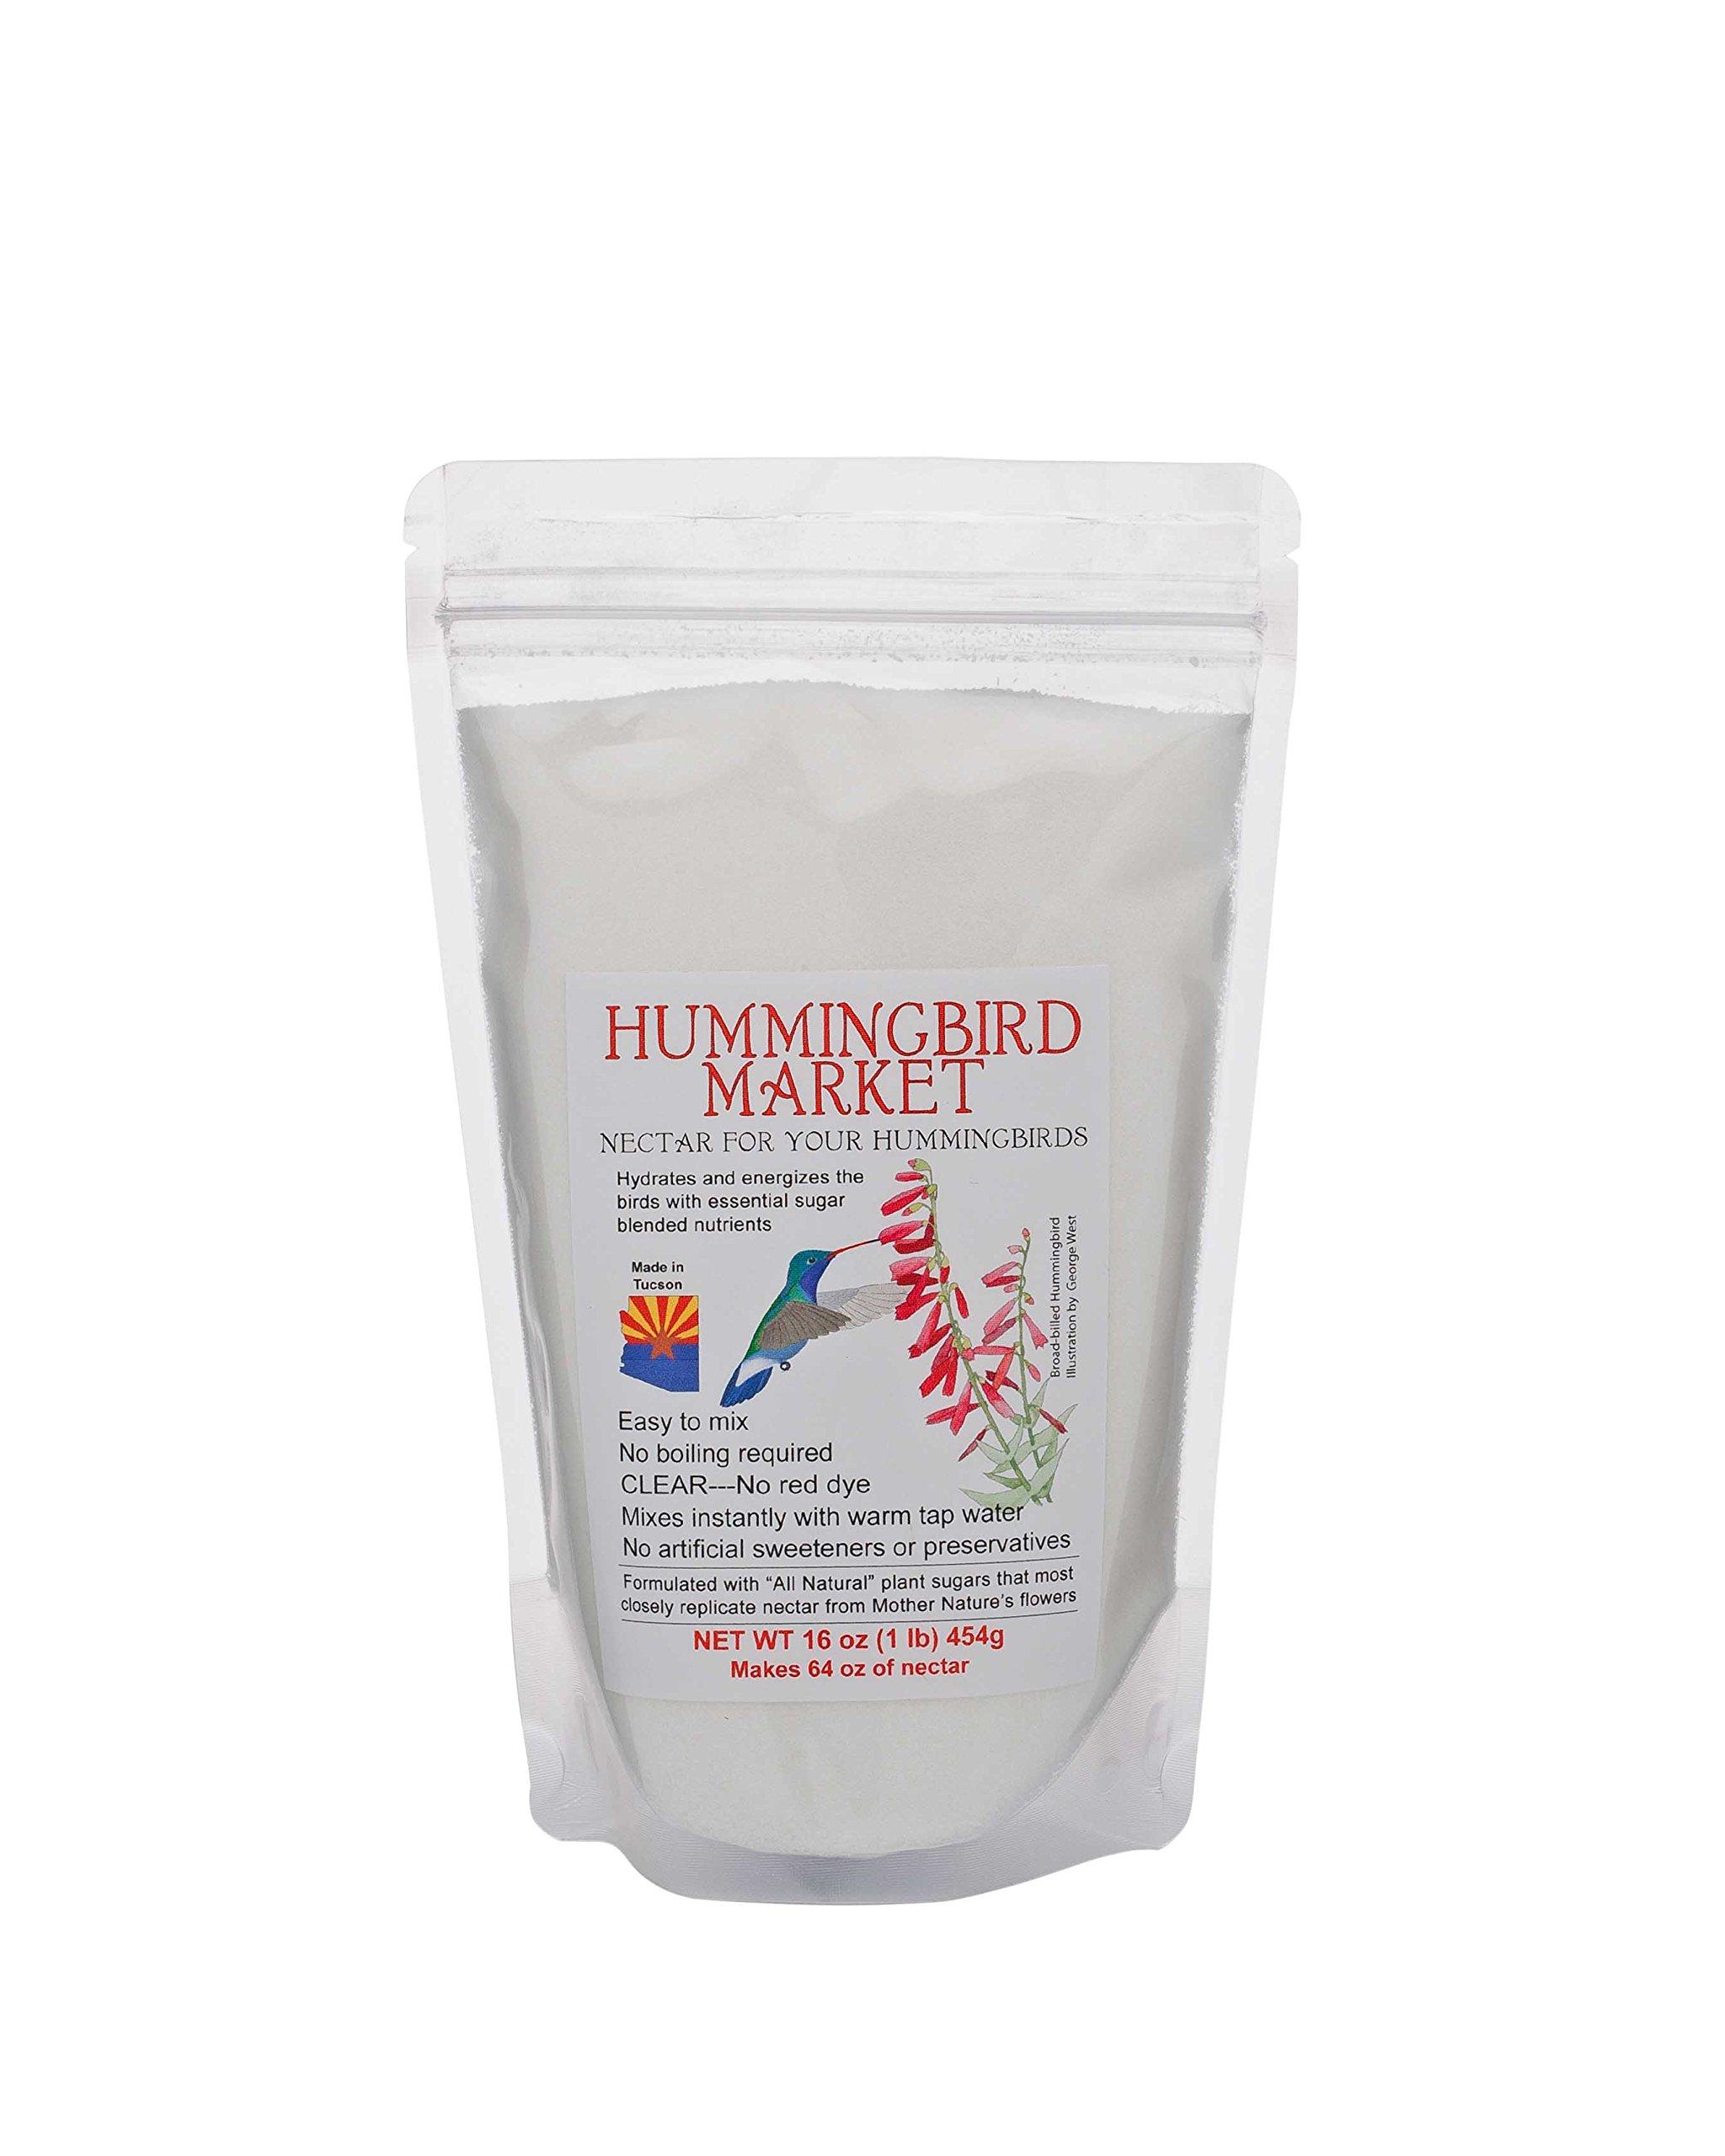 Hummingbird Nectar--- 1 lb/ 16 oz pouch makes 64 oz of nectar